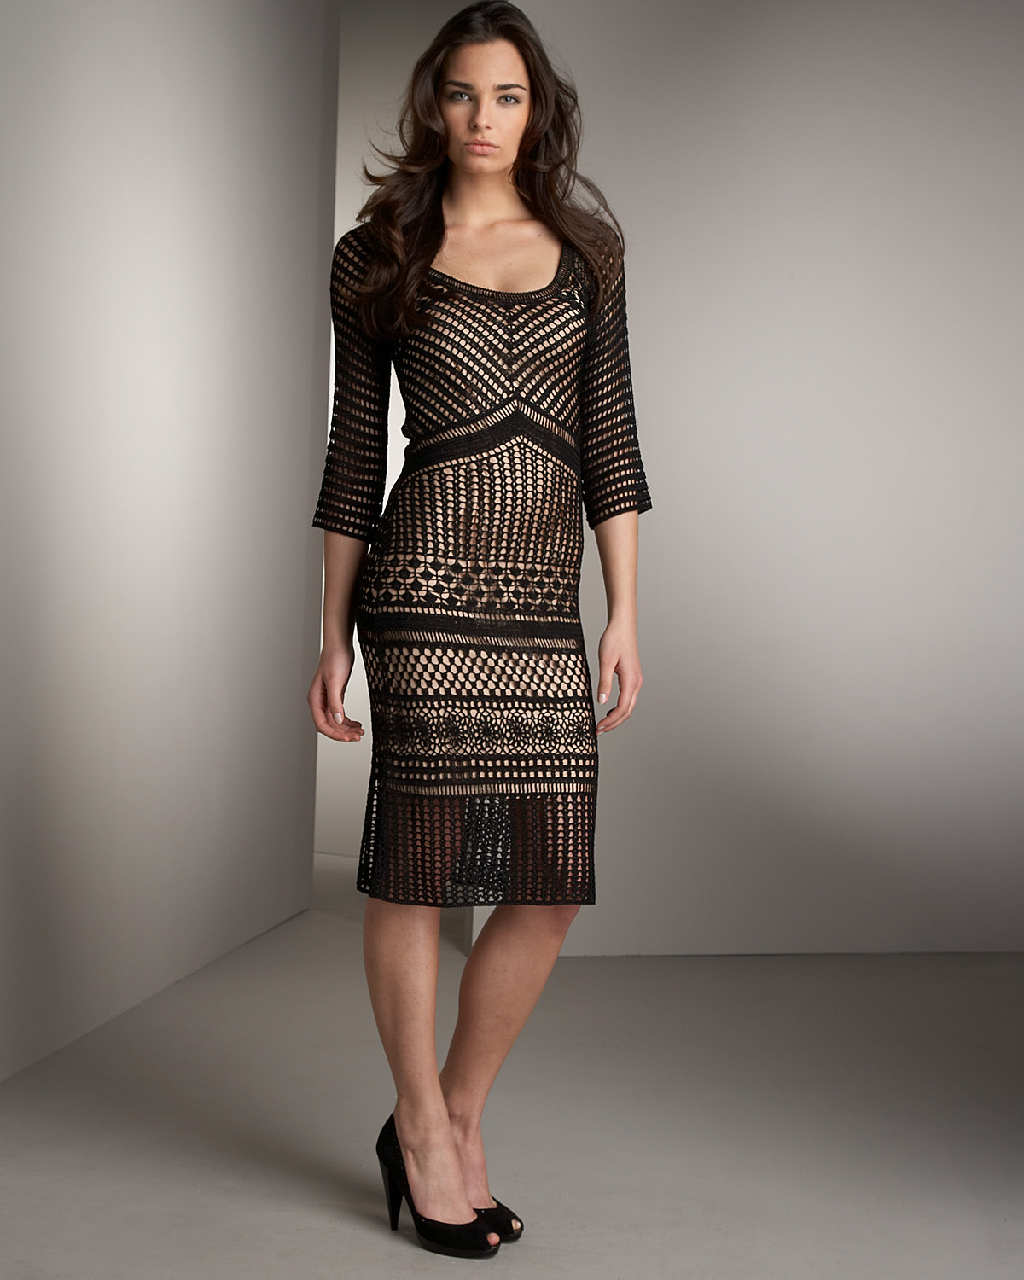 Neiman marcus black dress